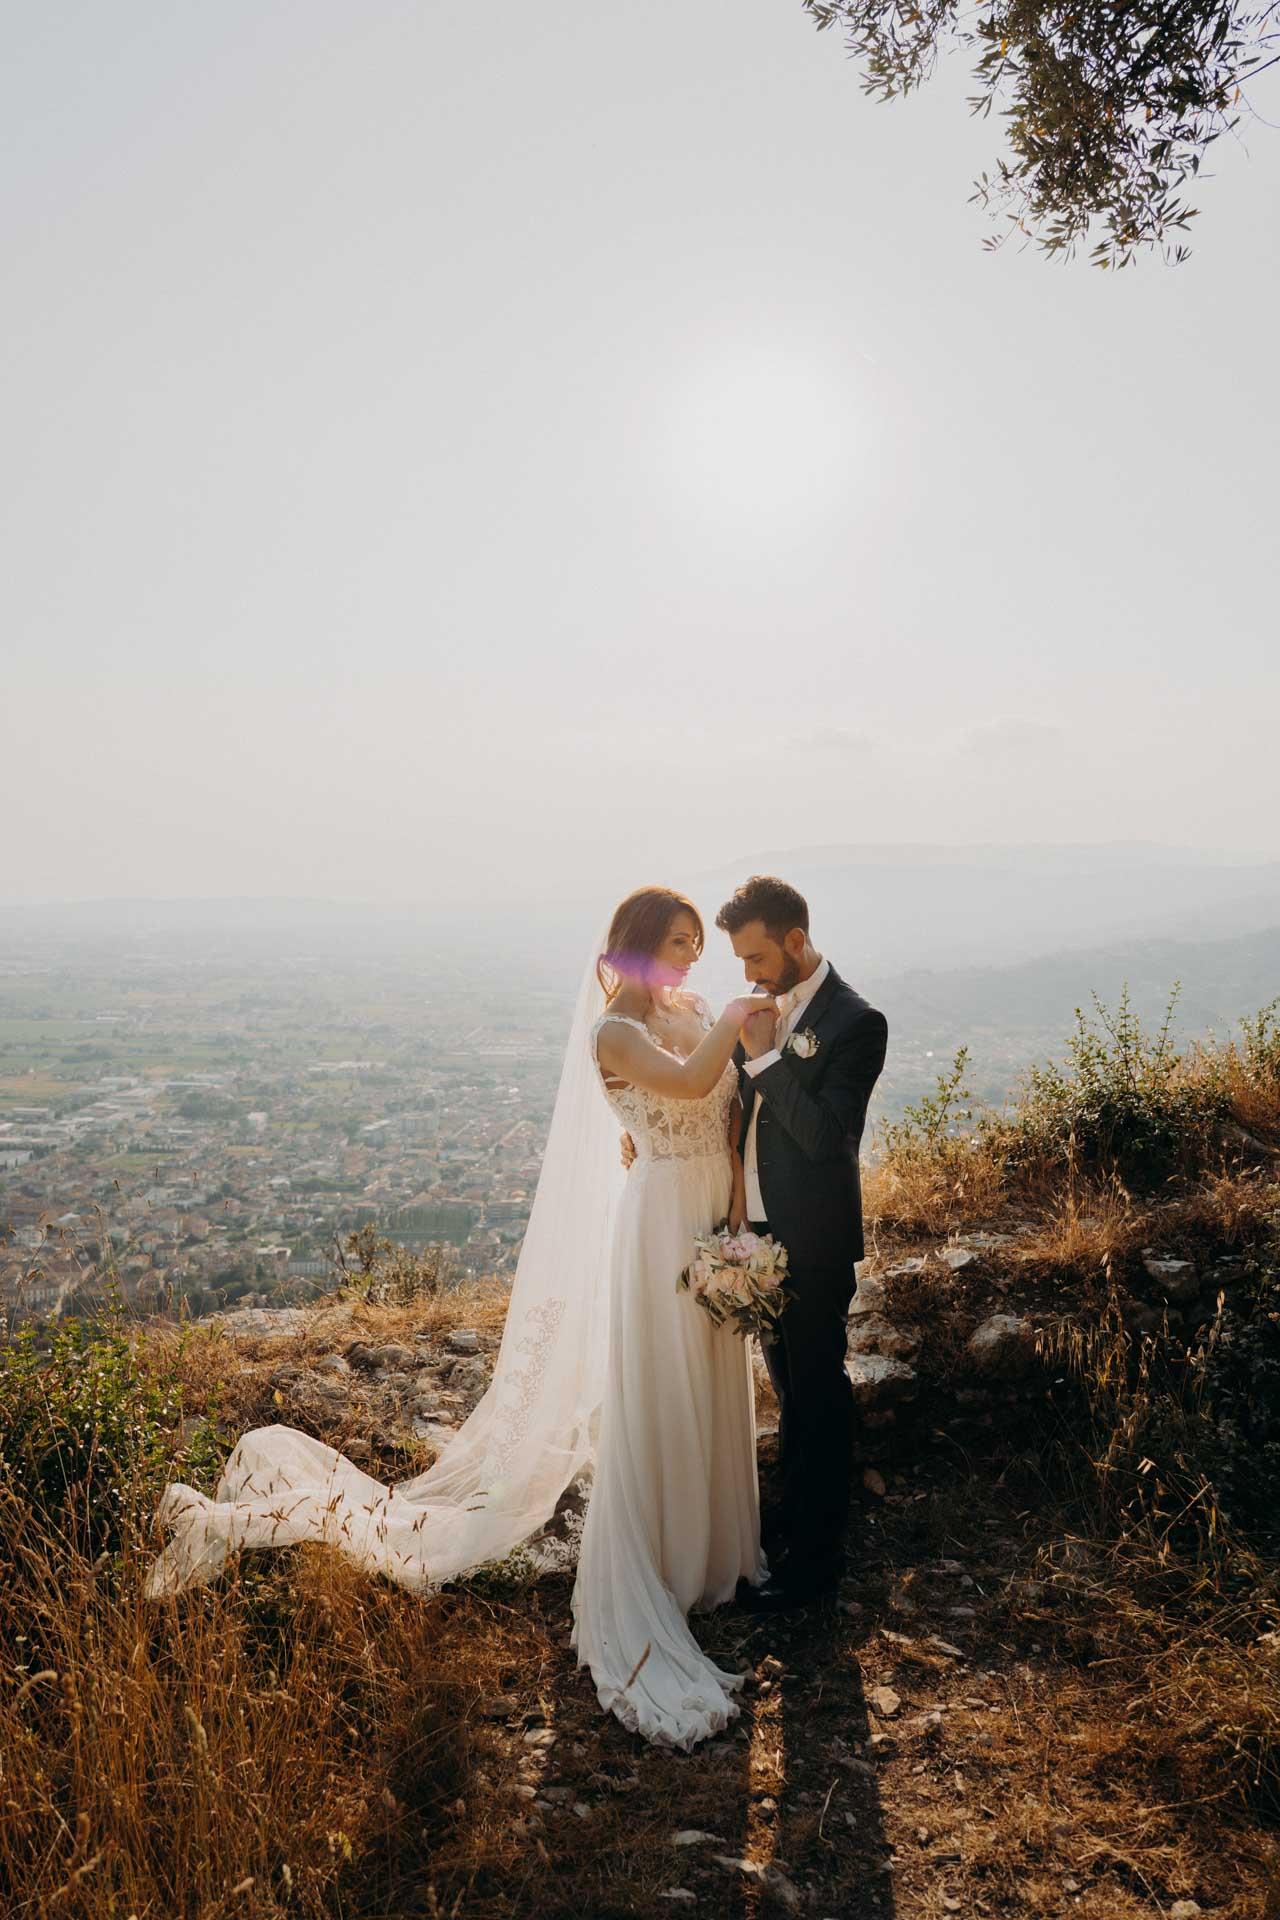 fotografo_matrimonio_toscana_poggio_tondo_83